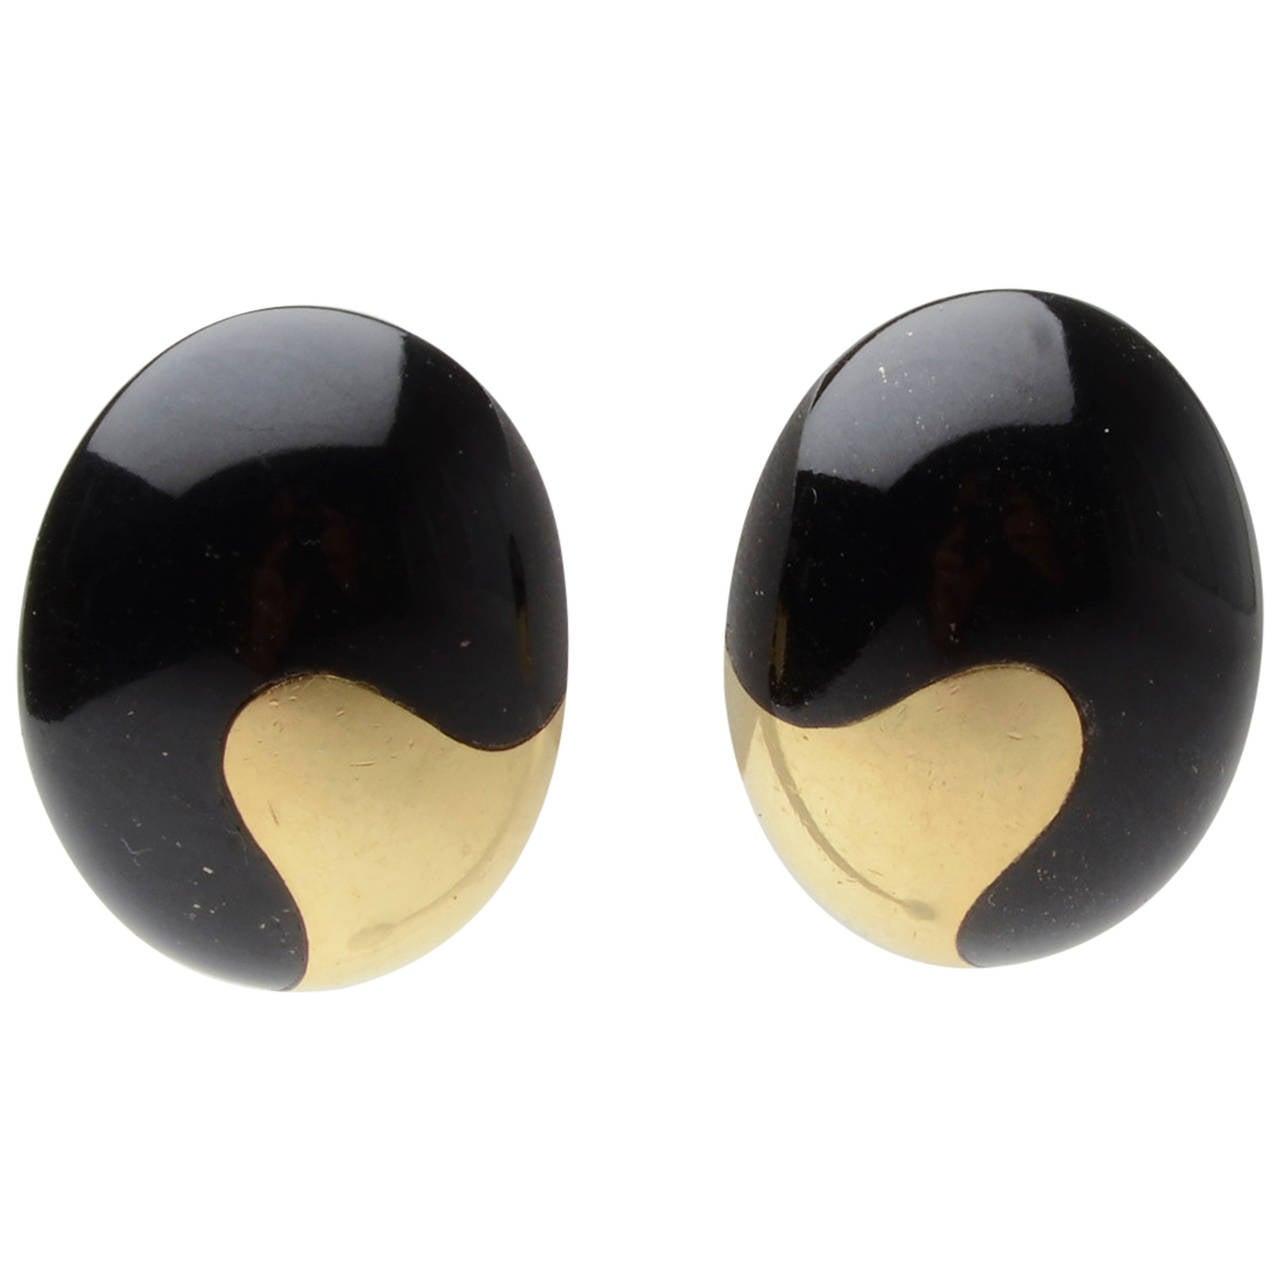 Tiffany & Co. Yin Yang Black Jade Earrings